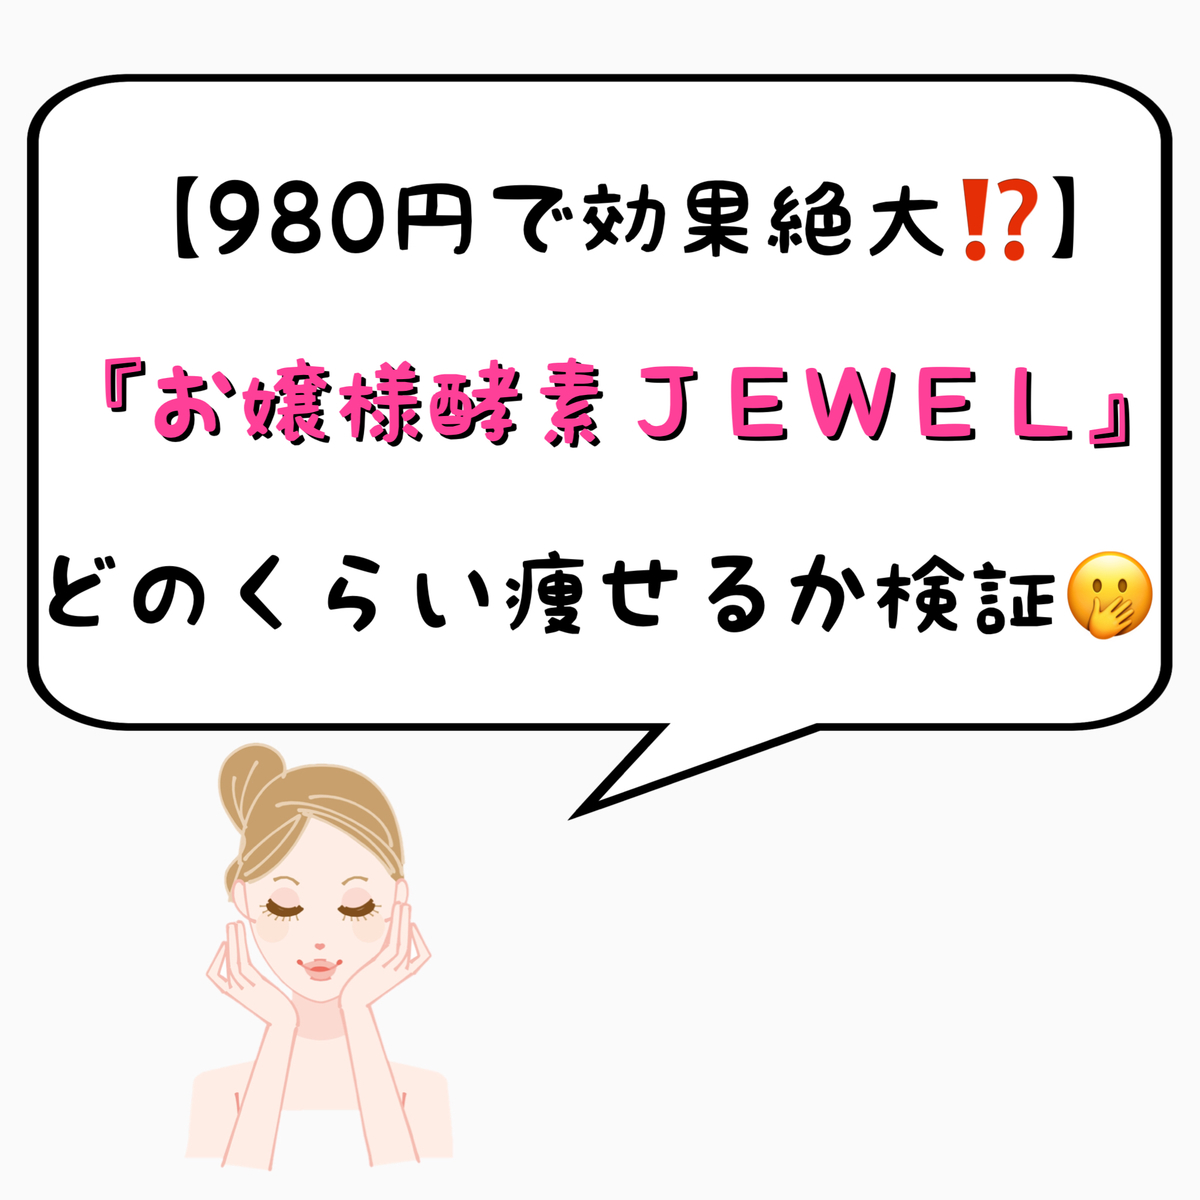 f:id:nokonoko_o:20210126113247j:plain